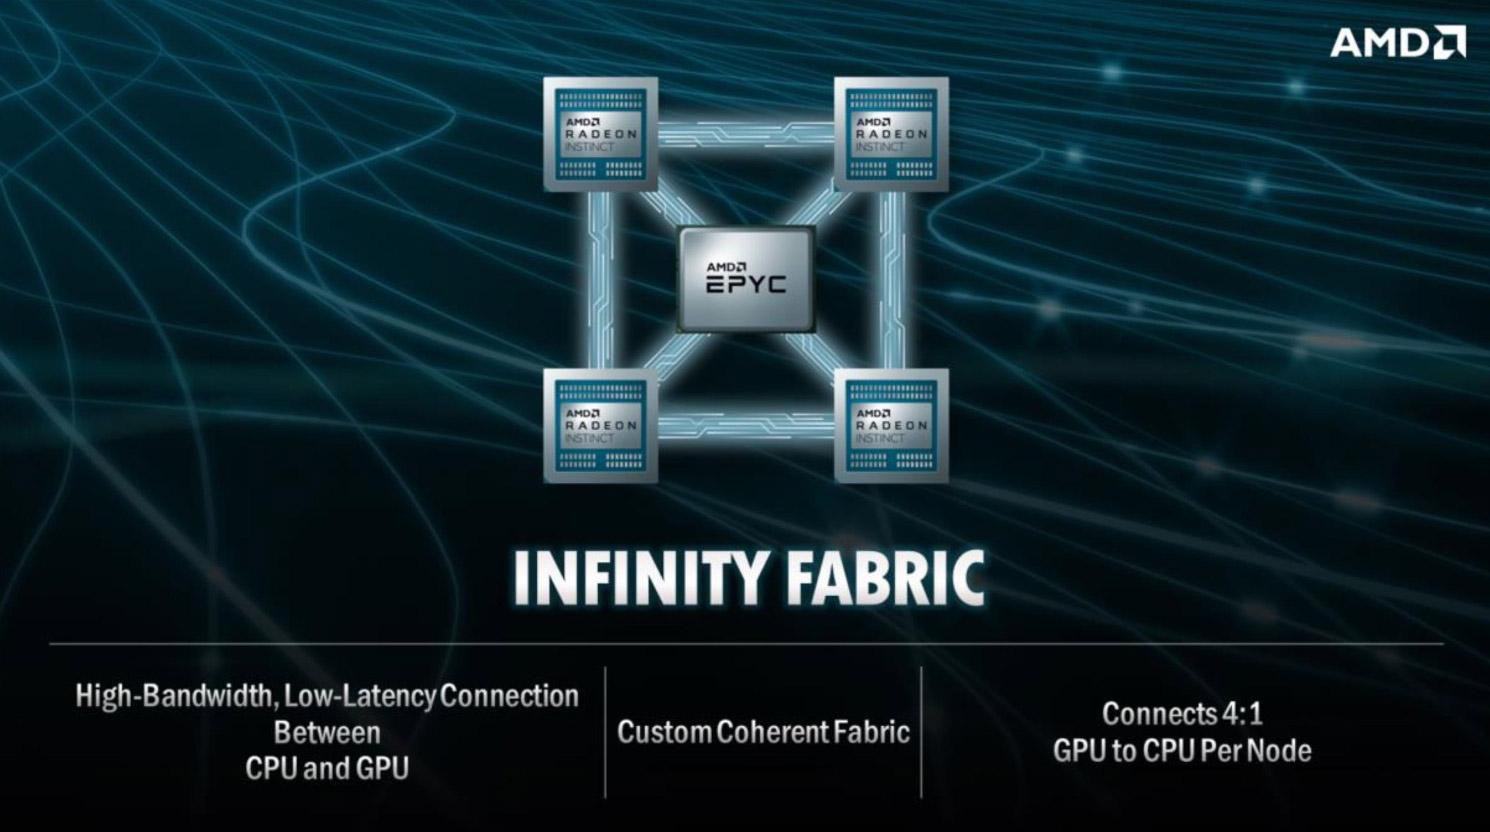 World's Fastest Supercomputer Will be Powered by AMD EPYC, Radeon Instinct - Processors 4